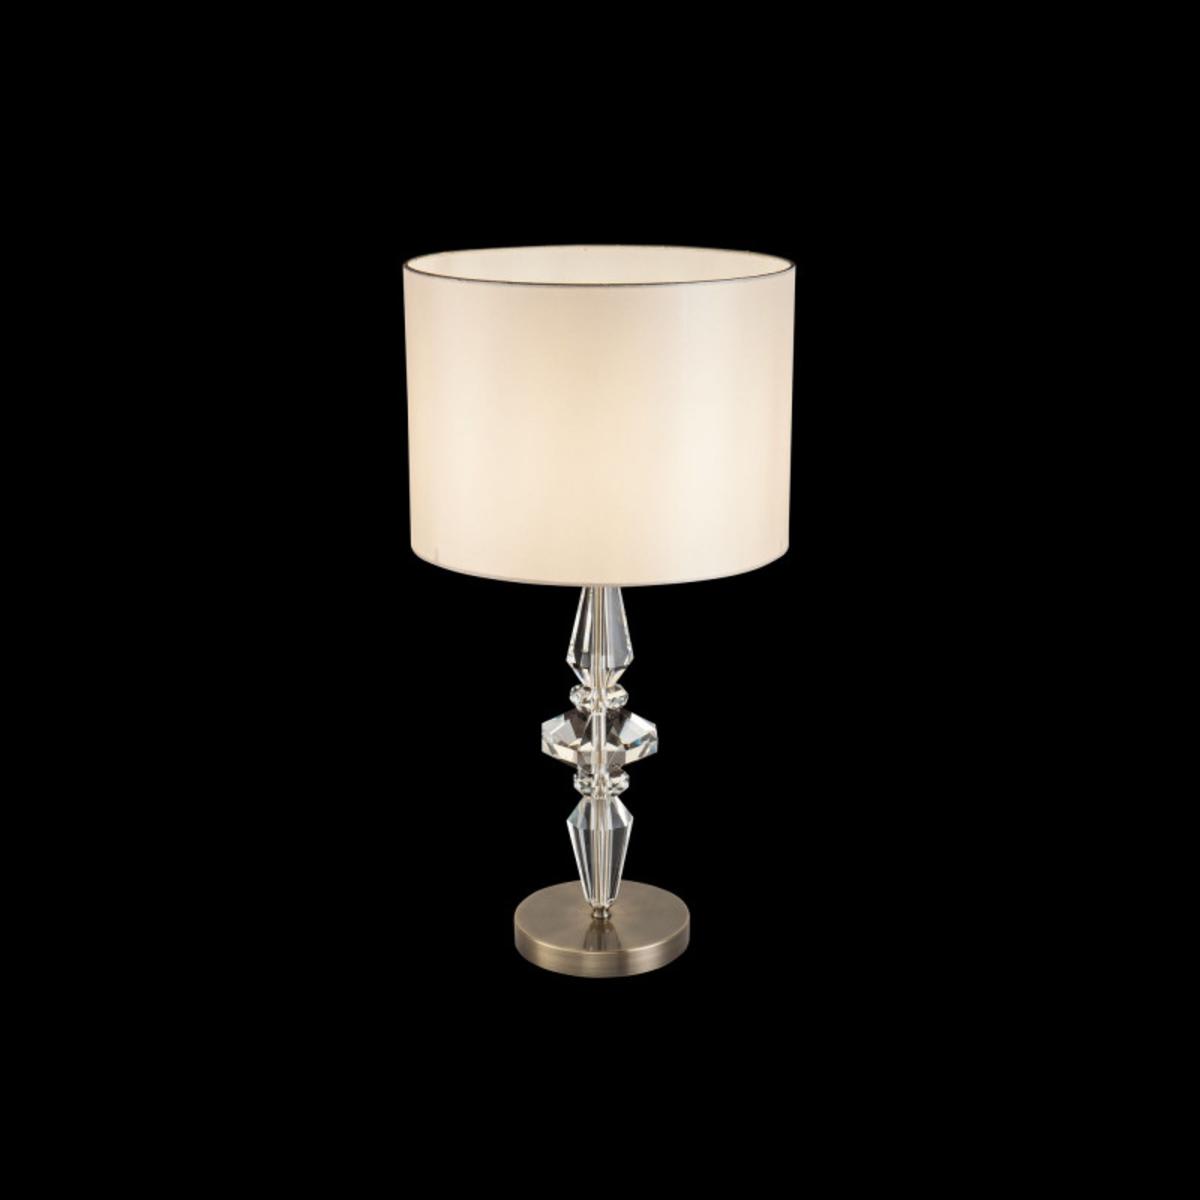 Купить Настольная лампа Diamant Crystal+DIA091TL Настольная лампа Maytoni DIA091TL-01BZ (14327), HomeMe